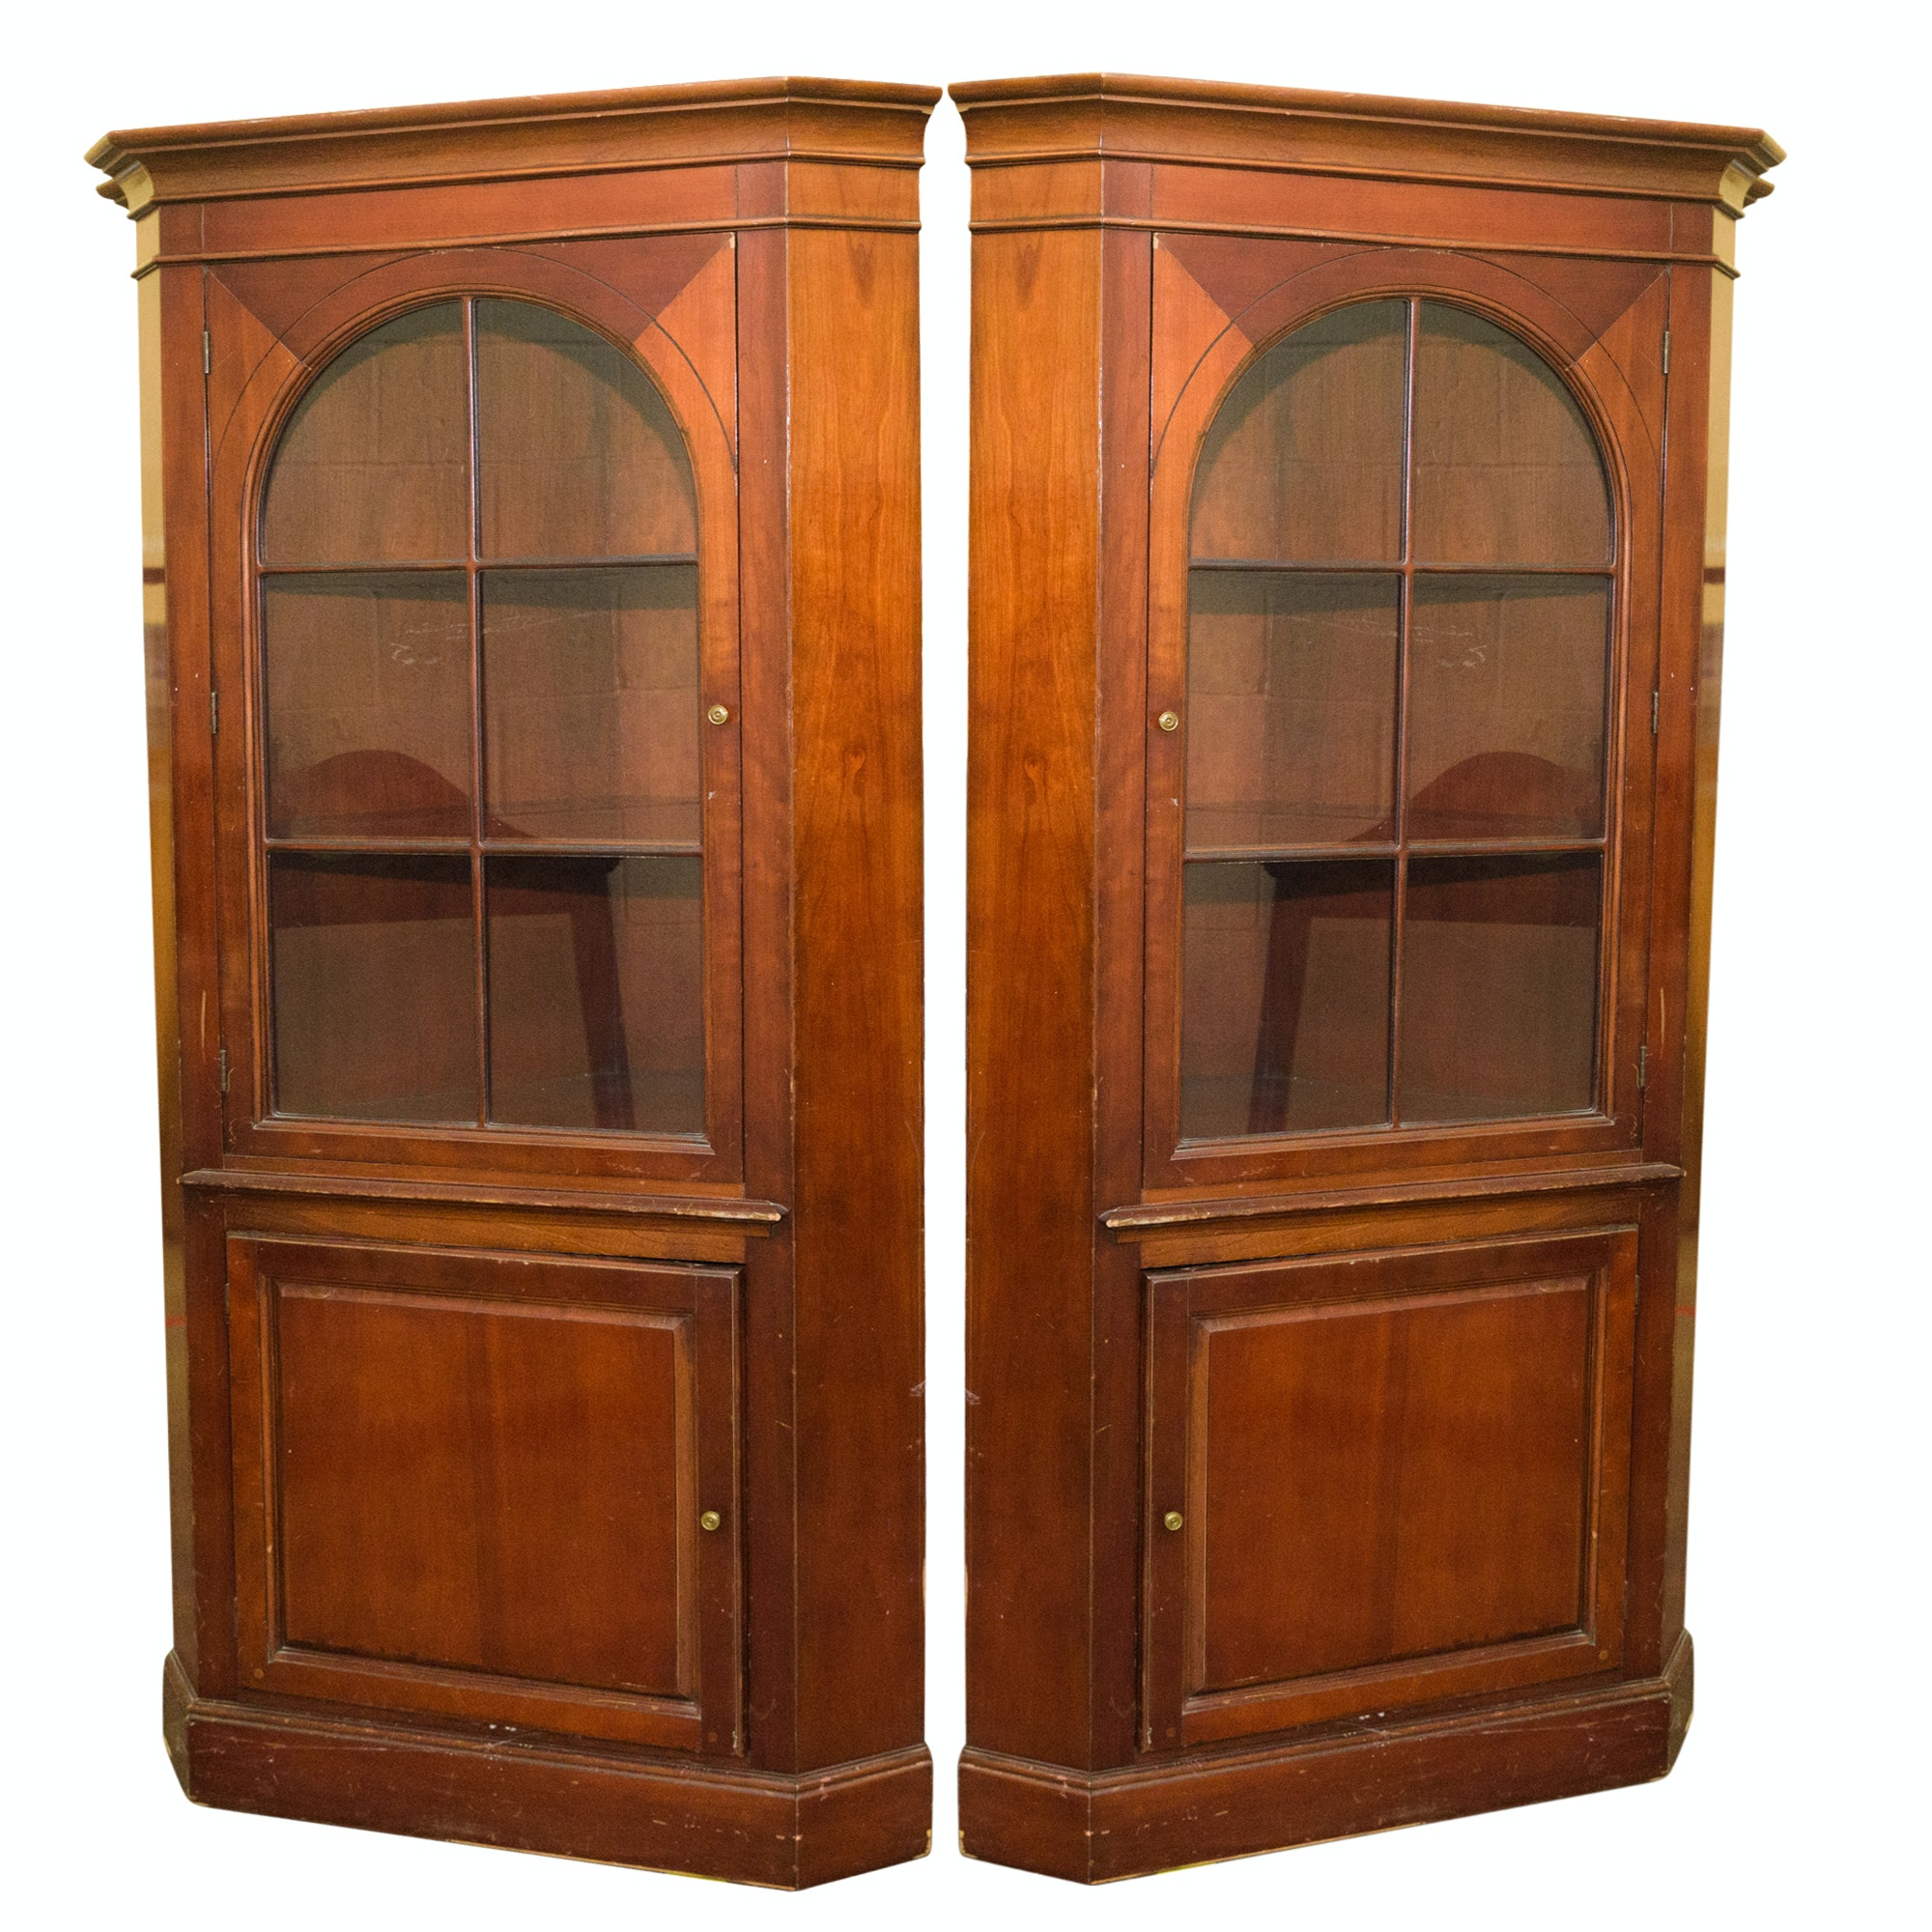 Pair of Vintage Corner Cabinets by Bernhardt